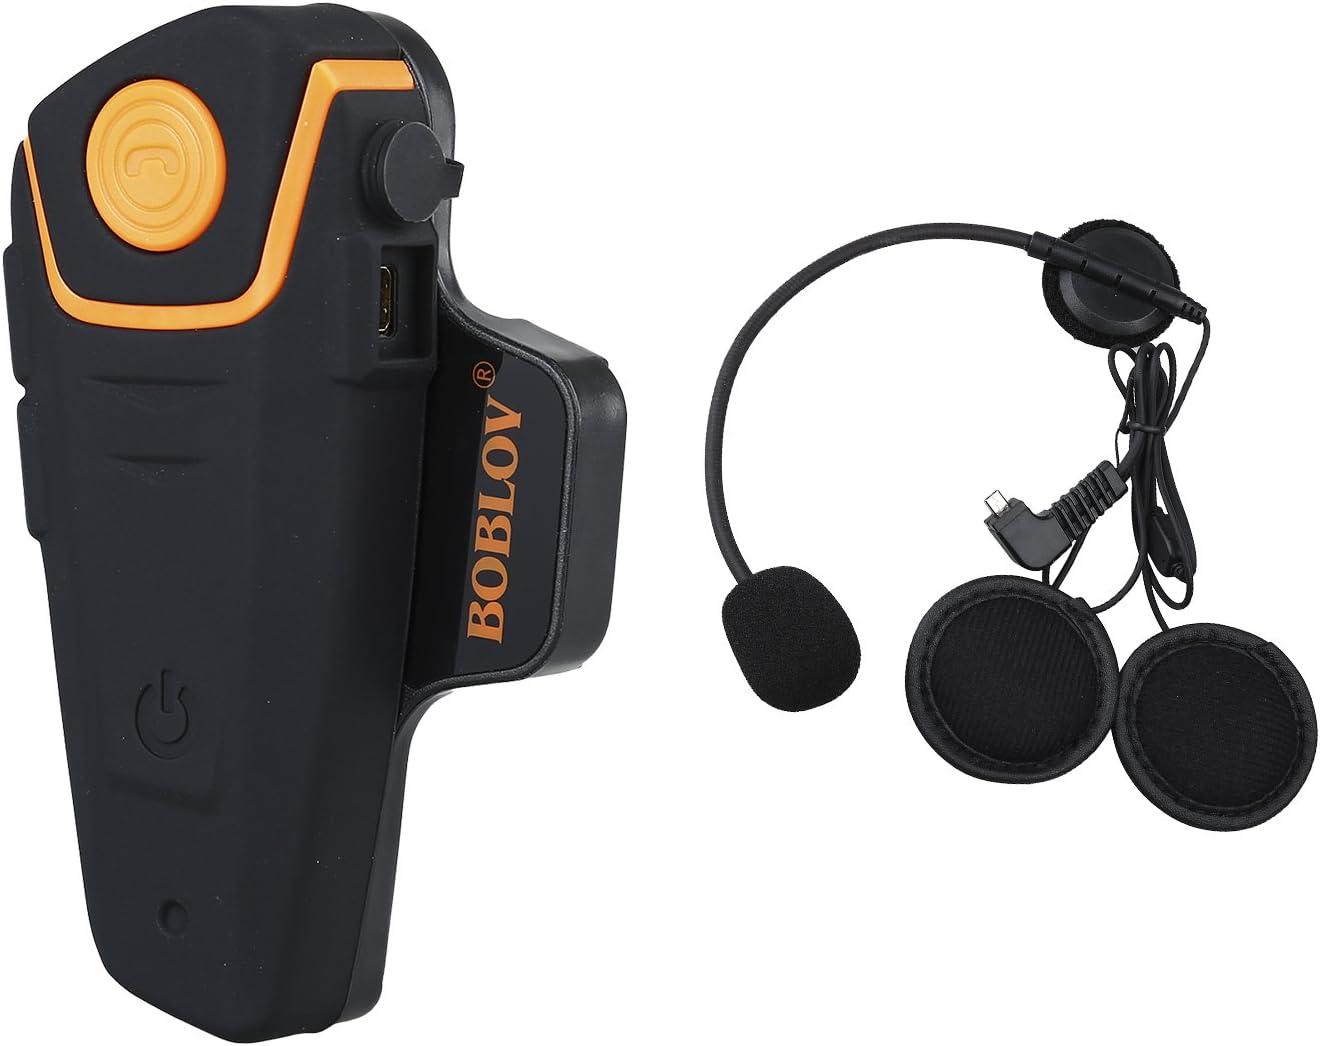 Bobov BT-S2 1000M BT casco de la motocicleta Auricular Bluetooth Intercom Moto Headset Intercom Interphone FM (Pack 1)